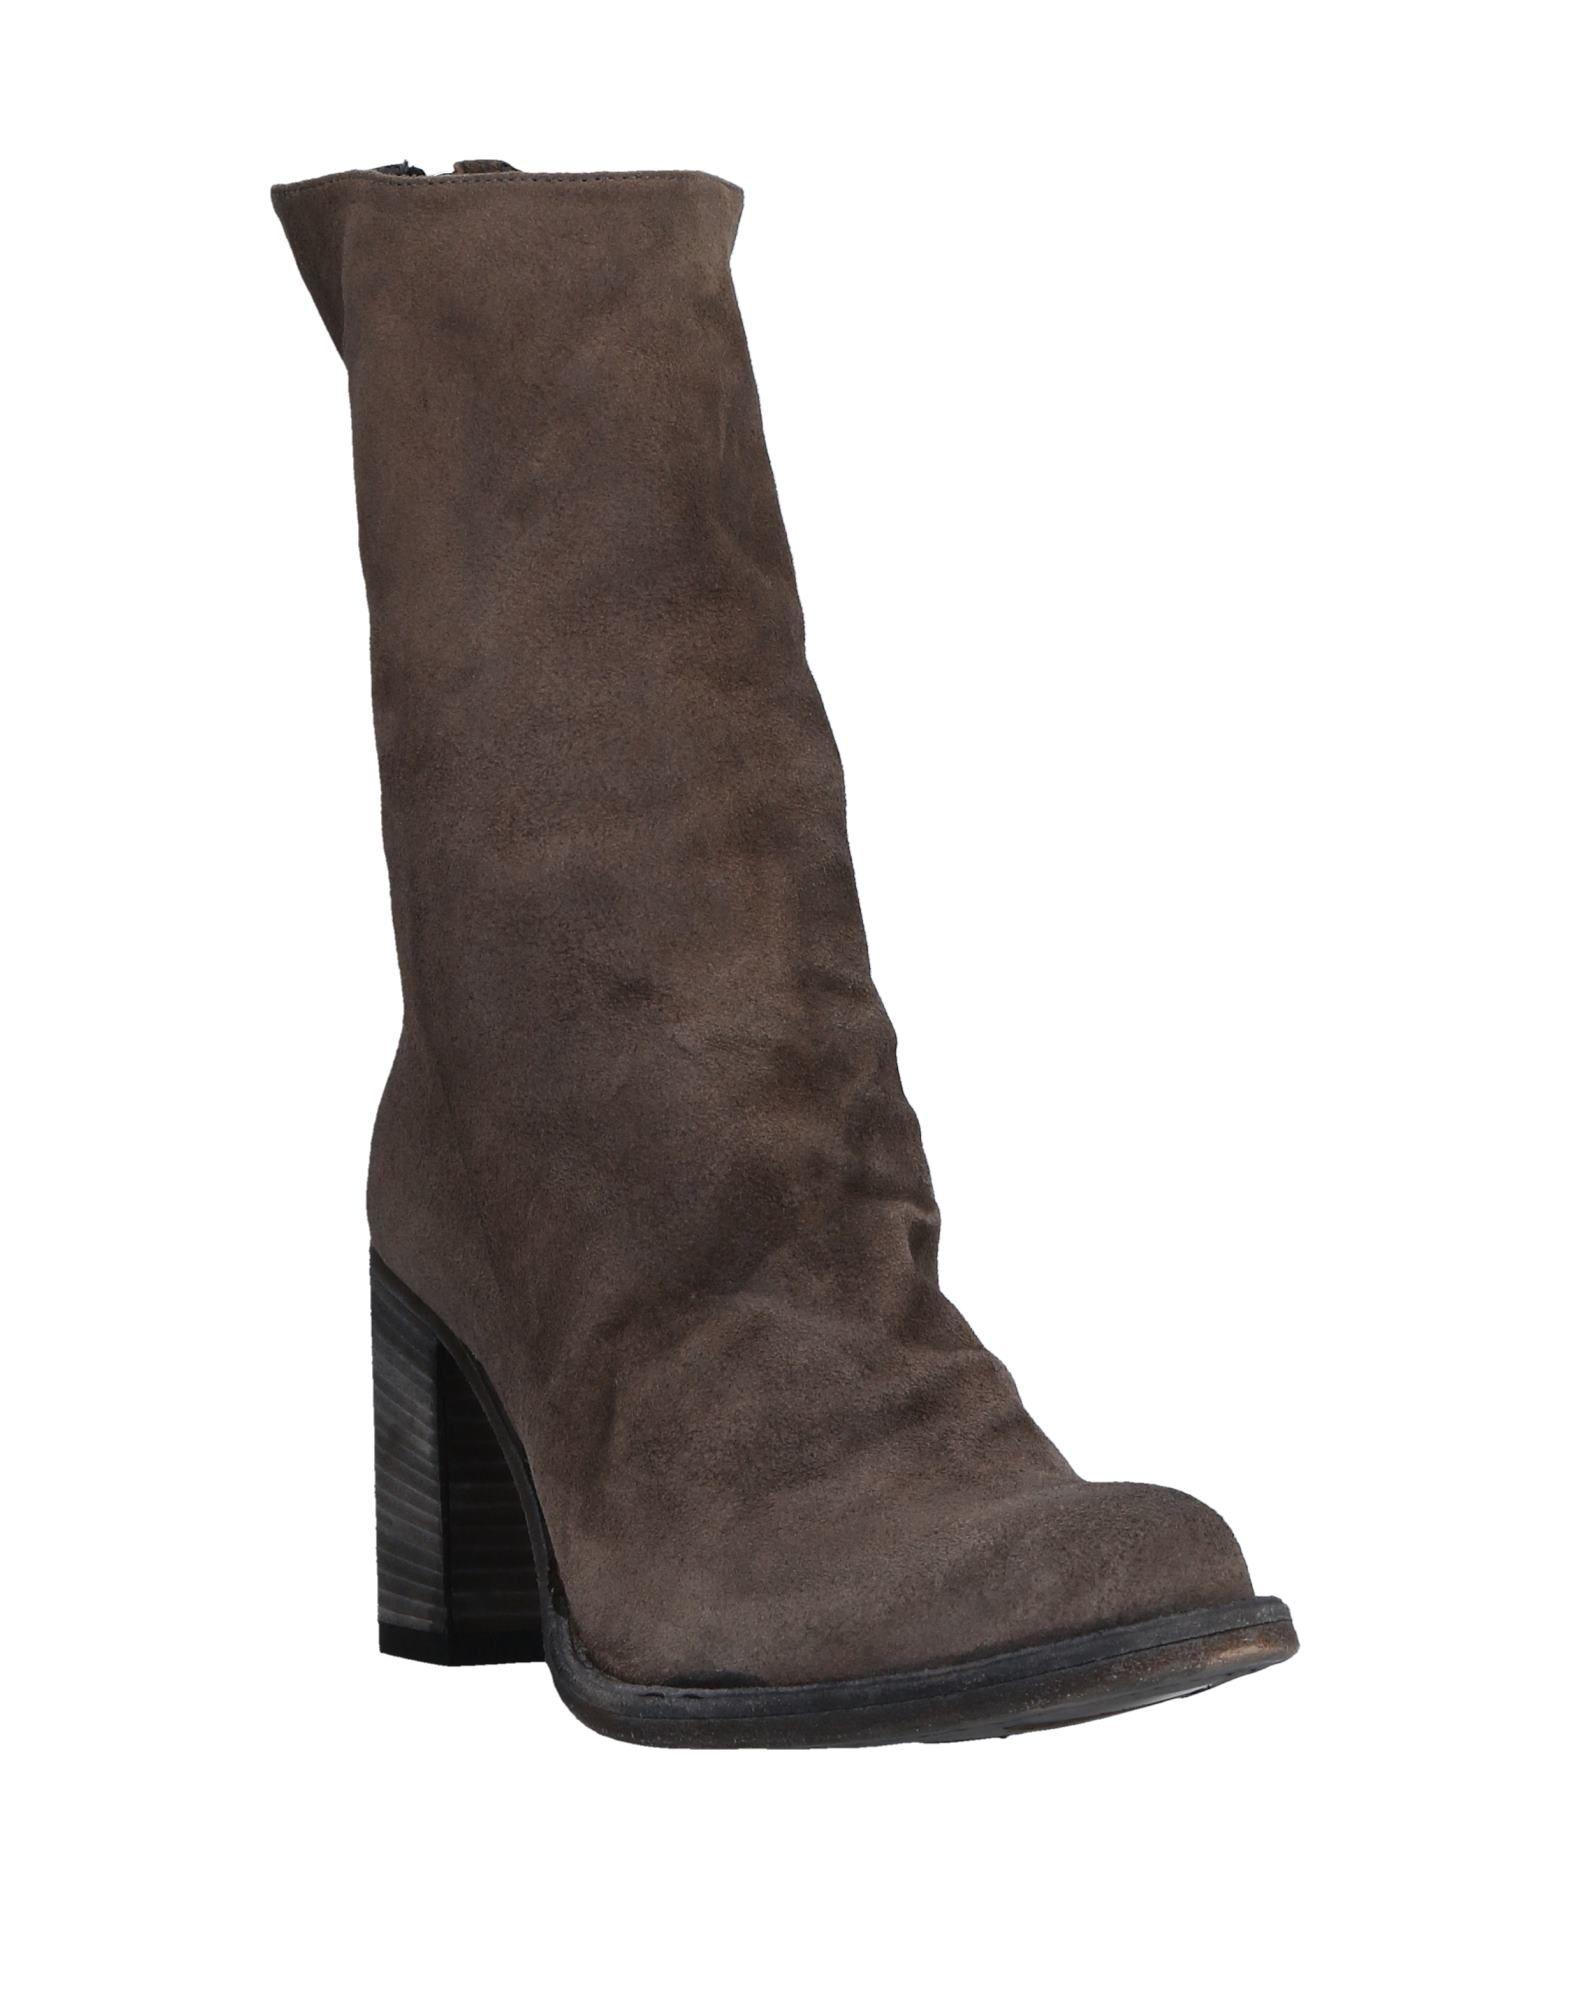 Officine Creative Italia Stiefelette aussehende Damen  11517216FEGünstige gut aussehende Stiefelette Schuhe 5b36c2